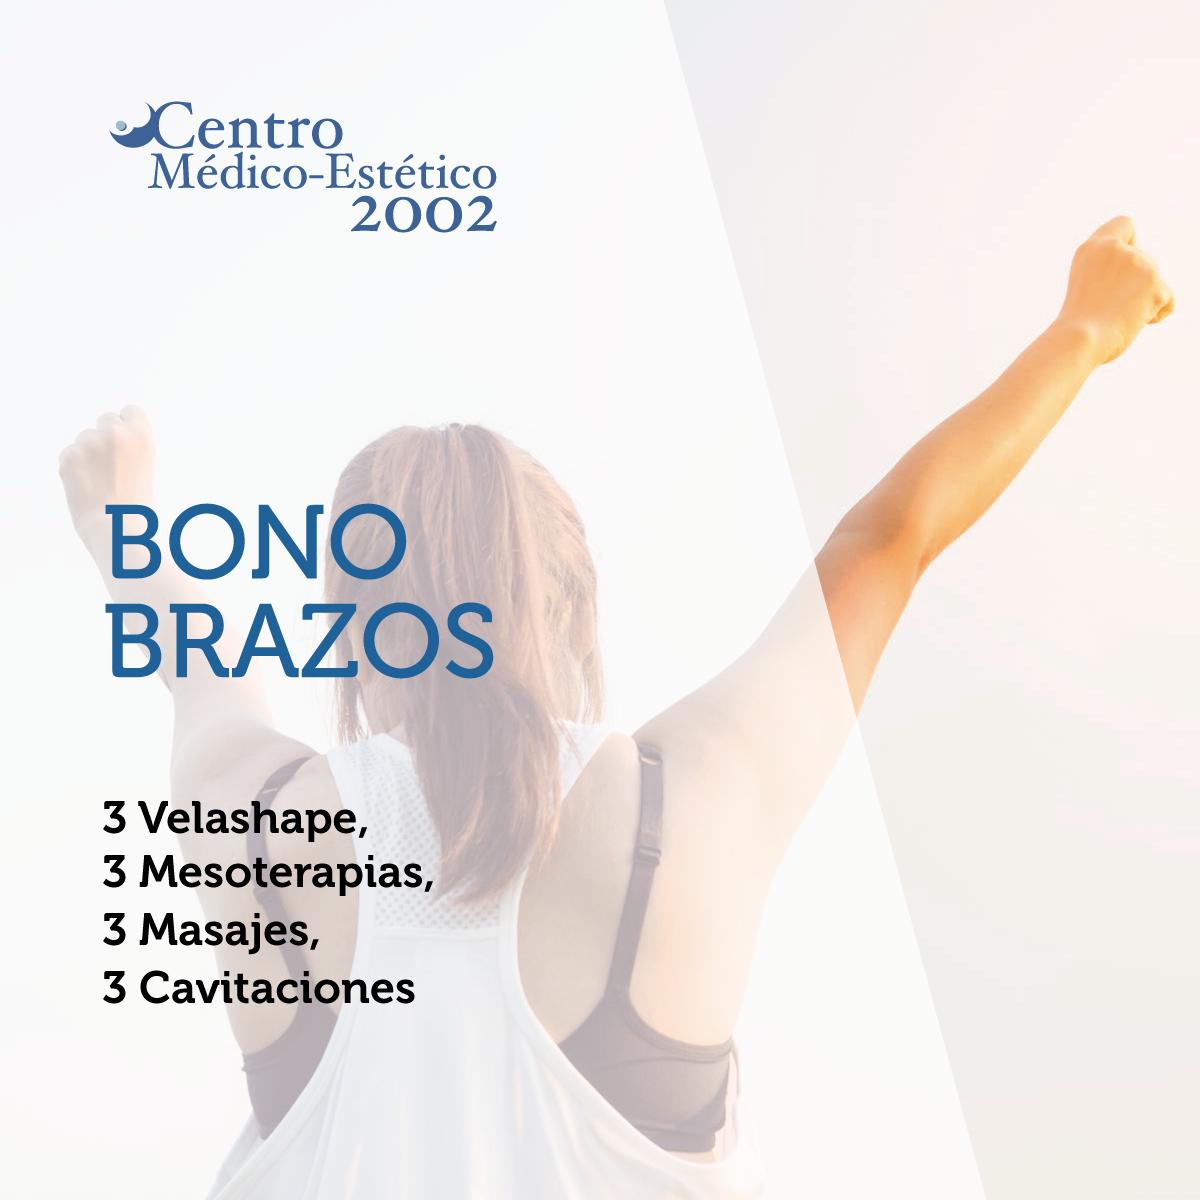 Bono Brazos